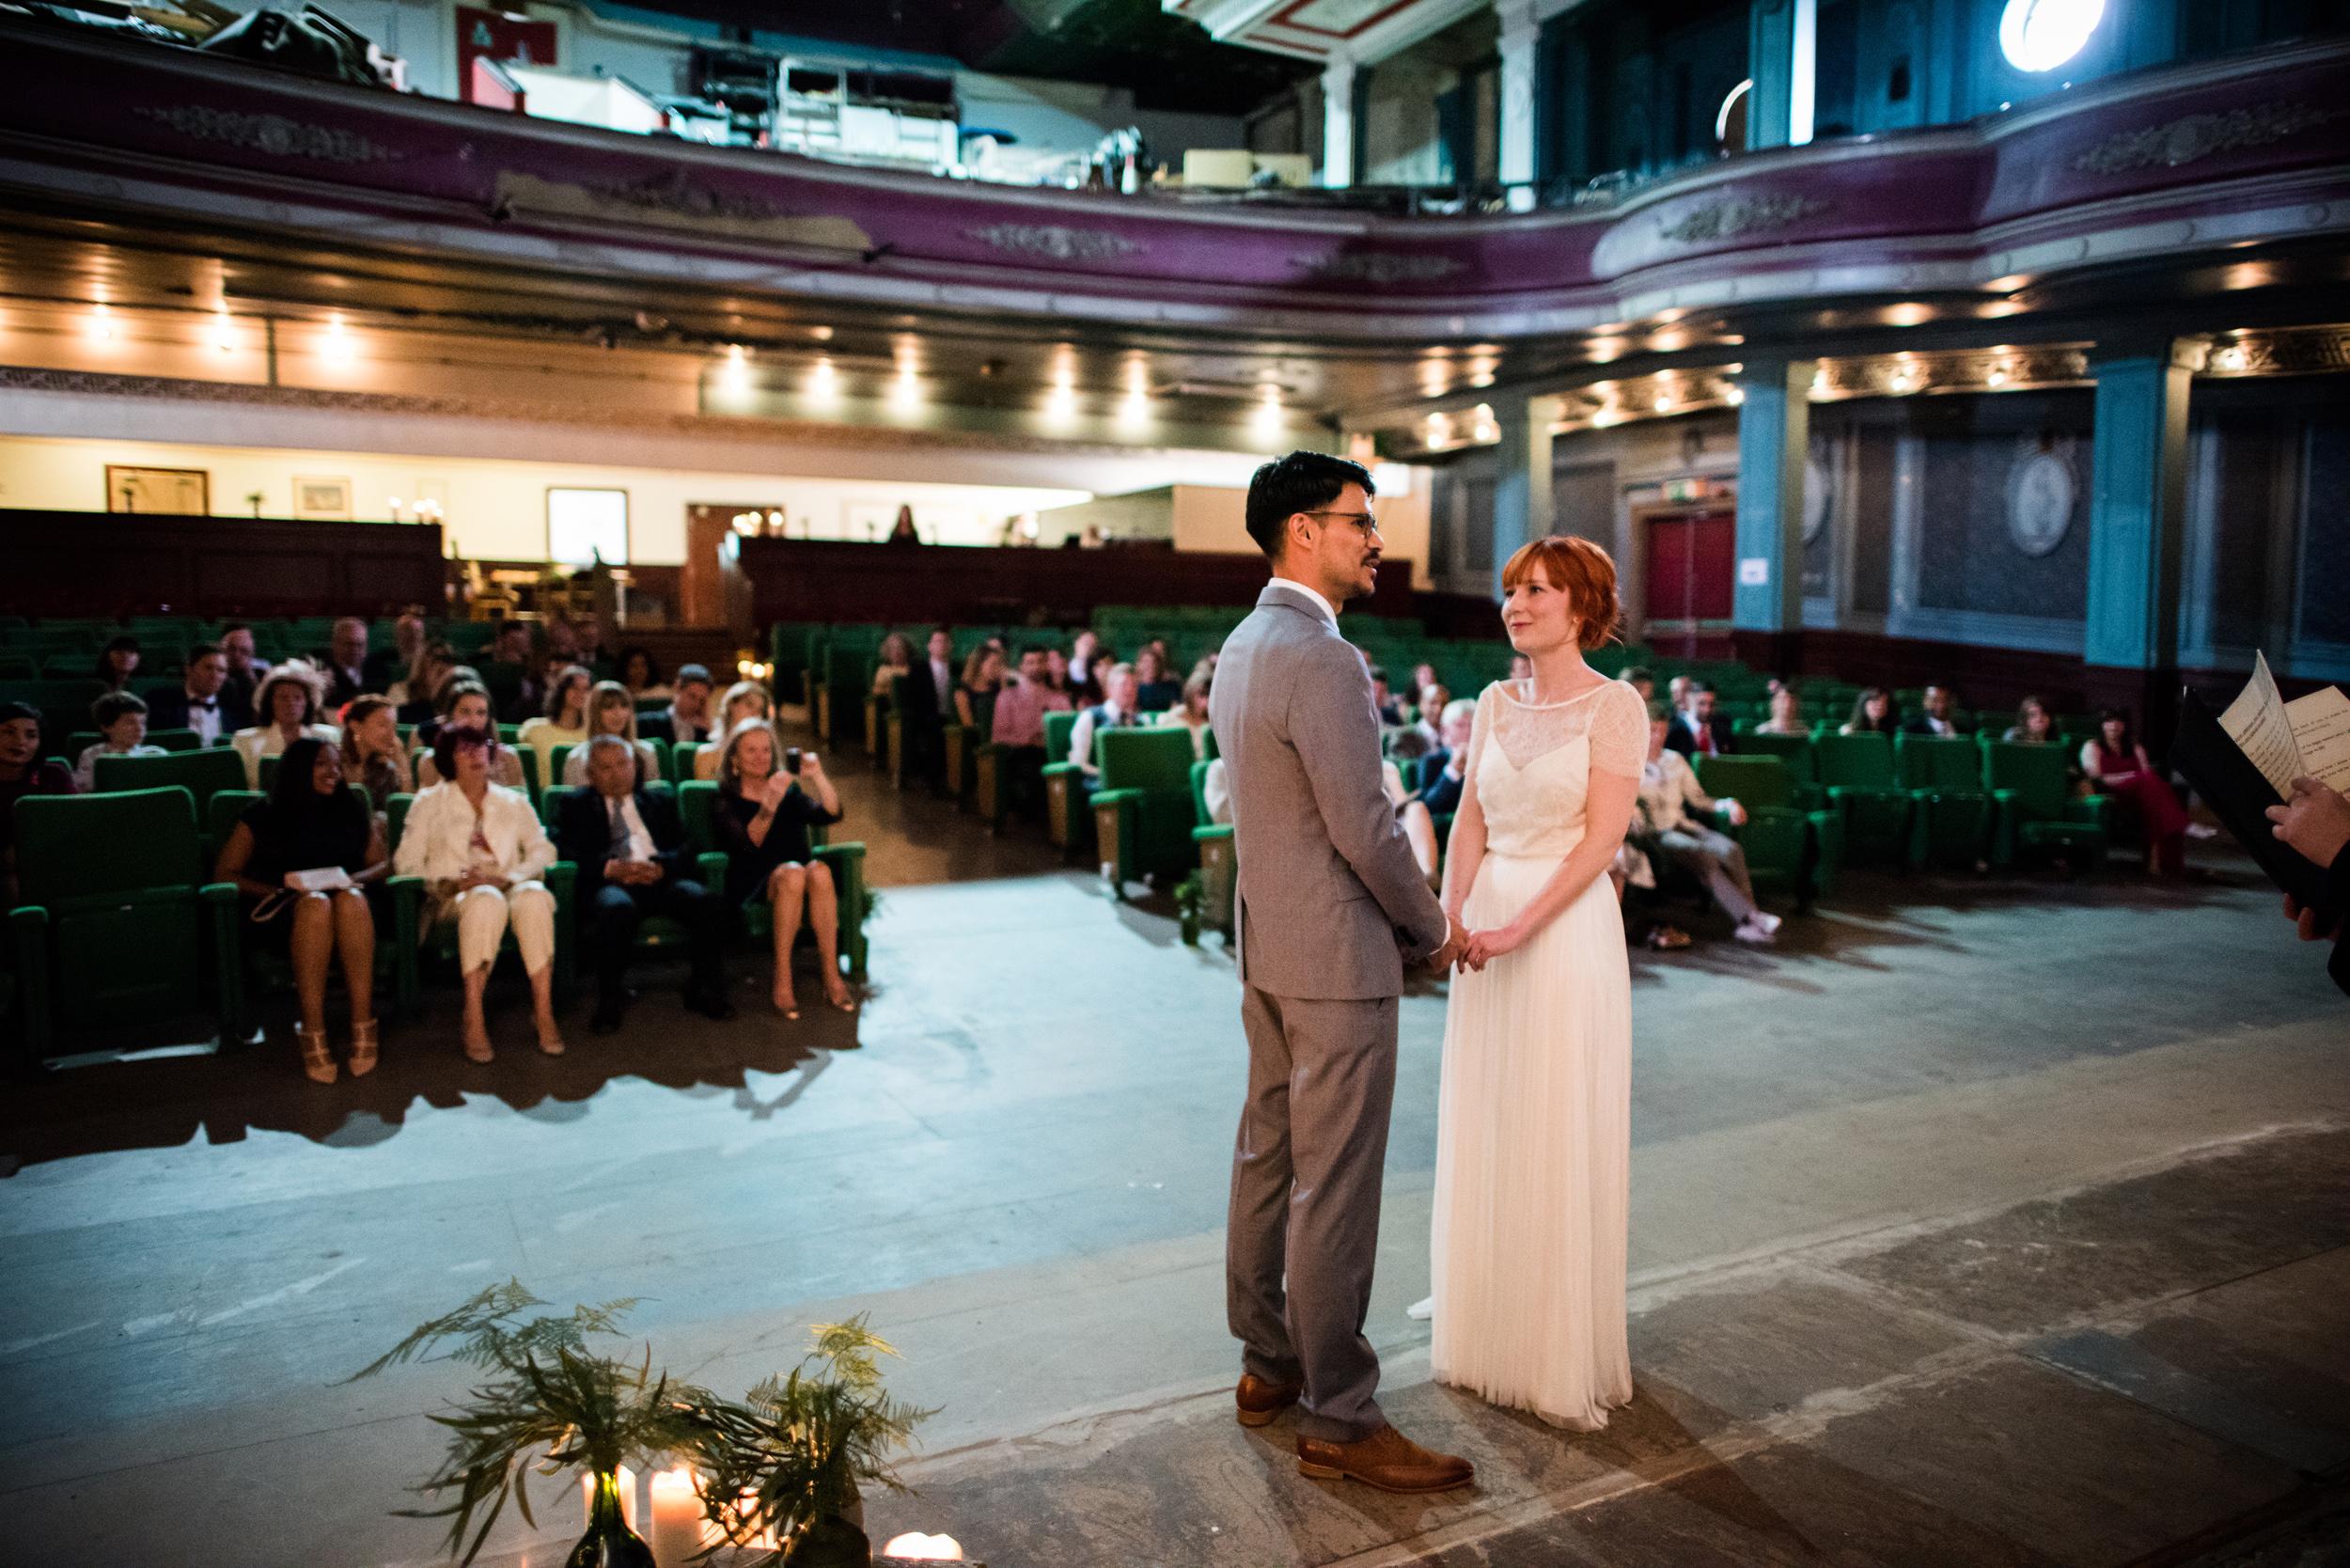 Jill-Kate-Beaumont-Lace-Sheffield-Wedding-6.jpg